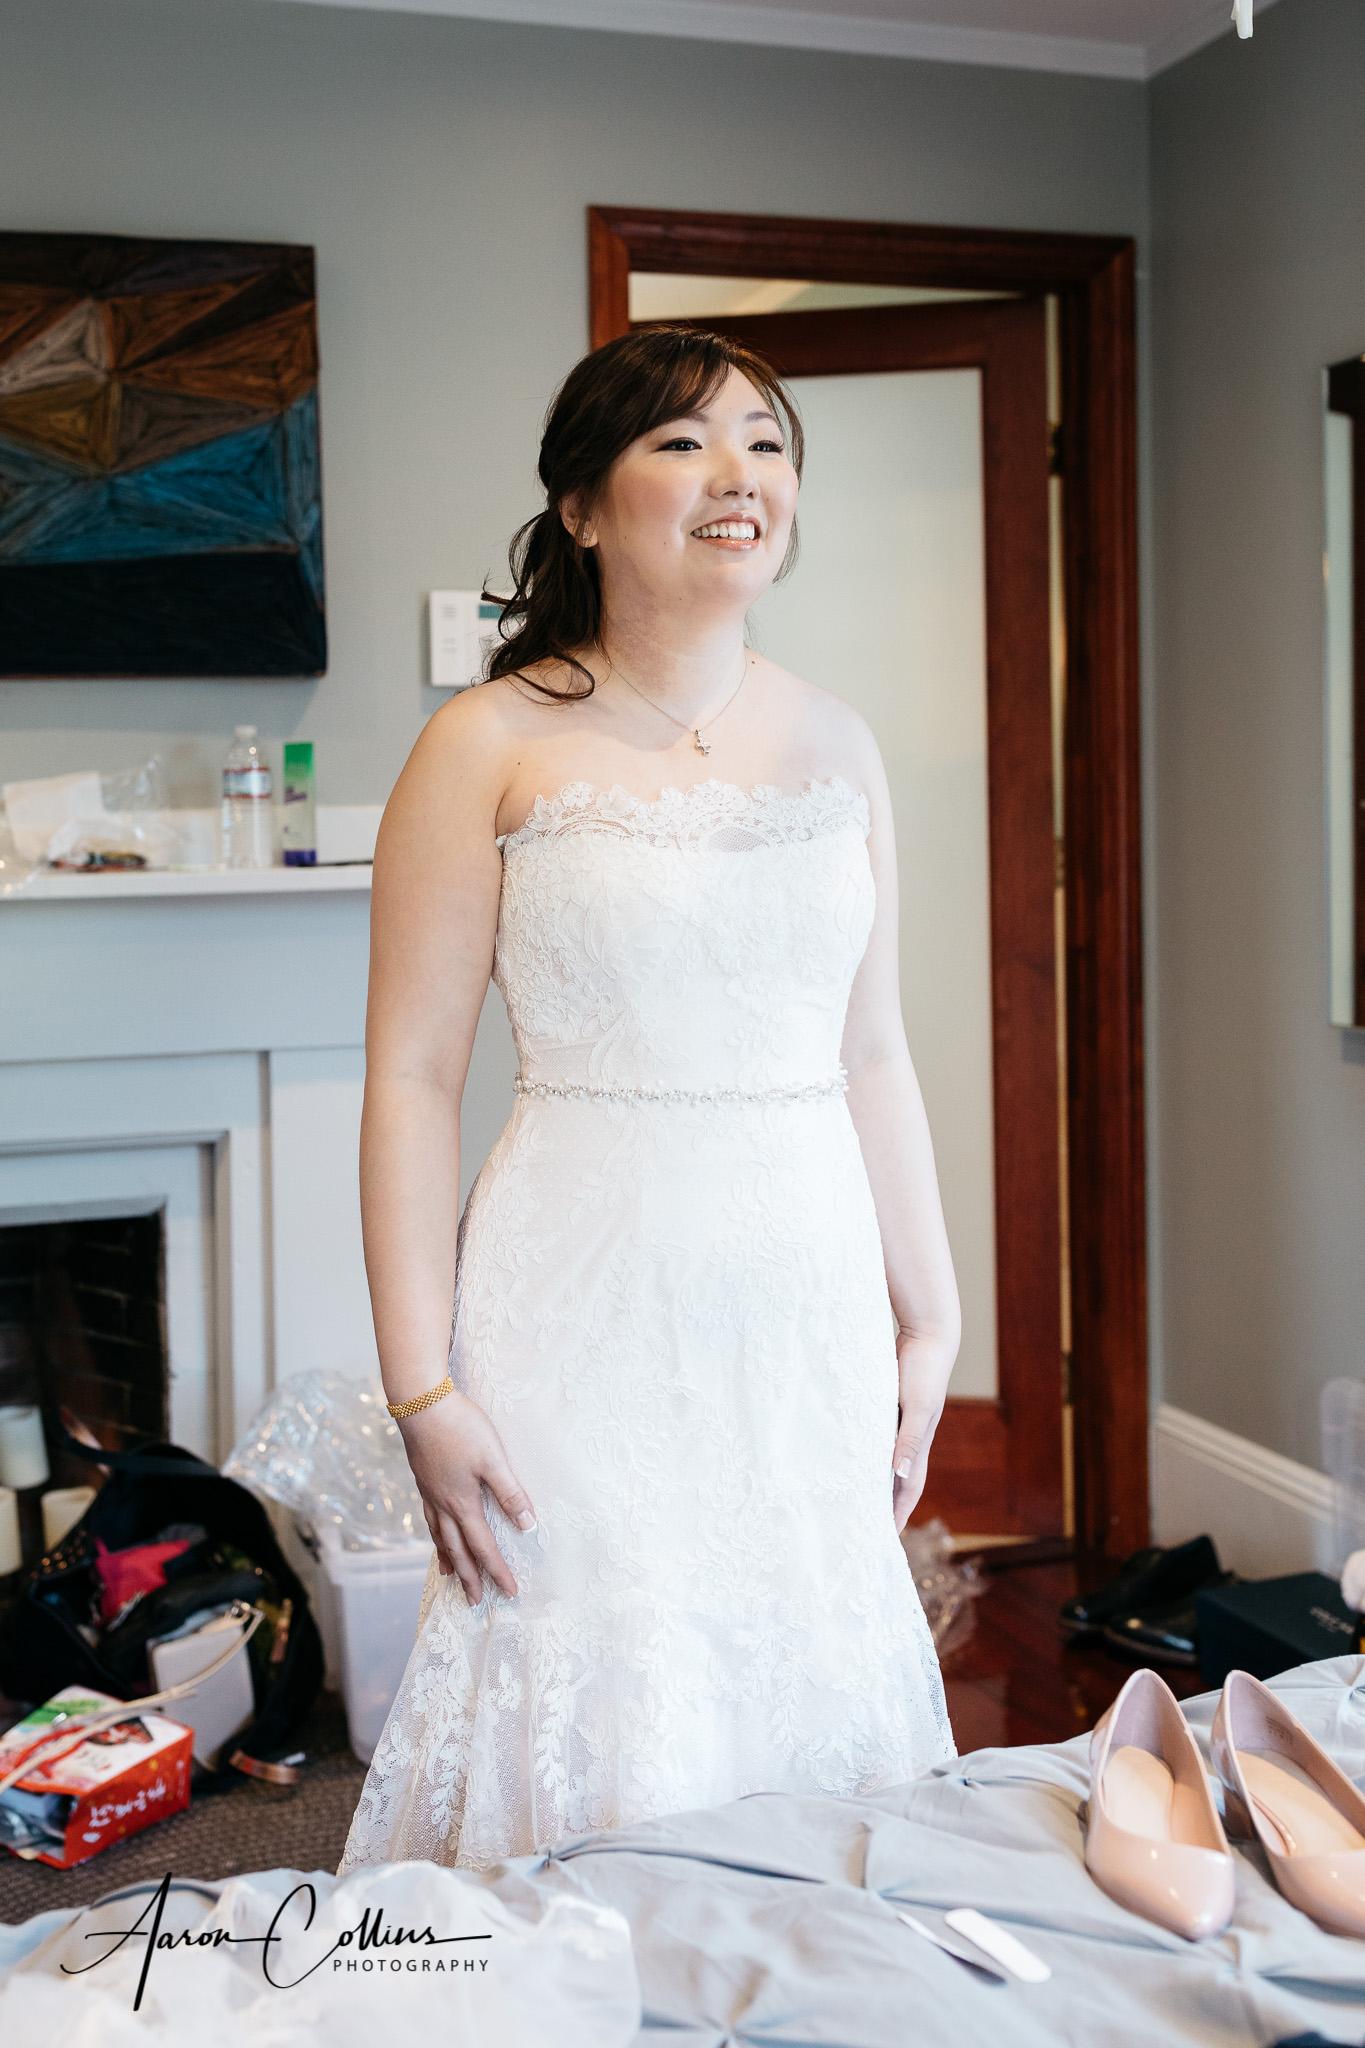 The bride feeling proud in her wedding dress.